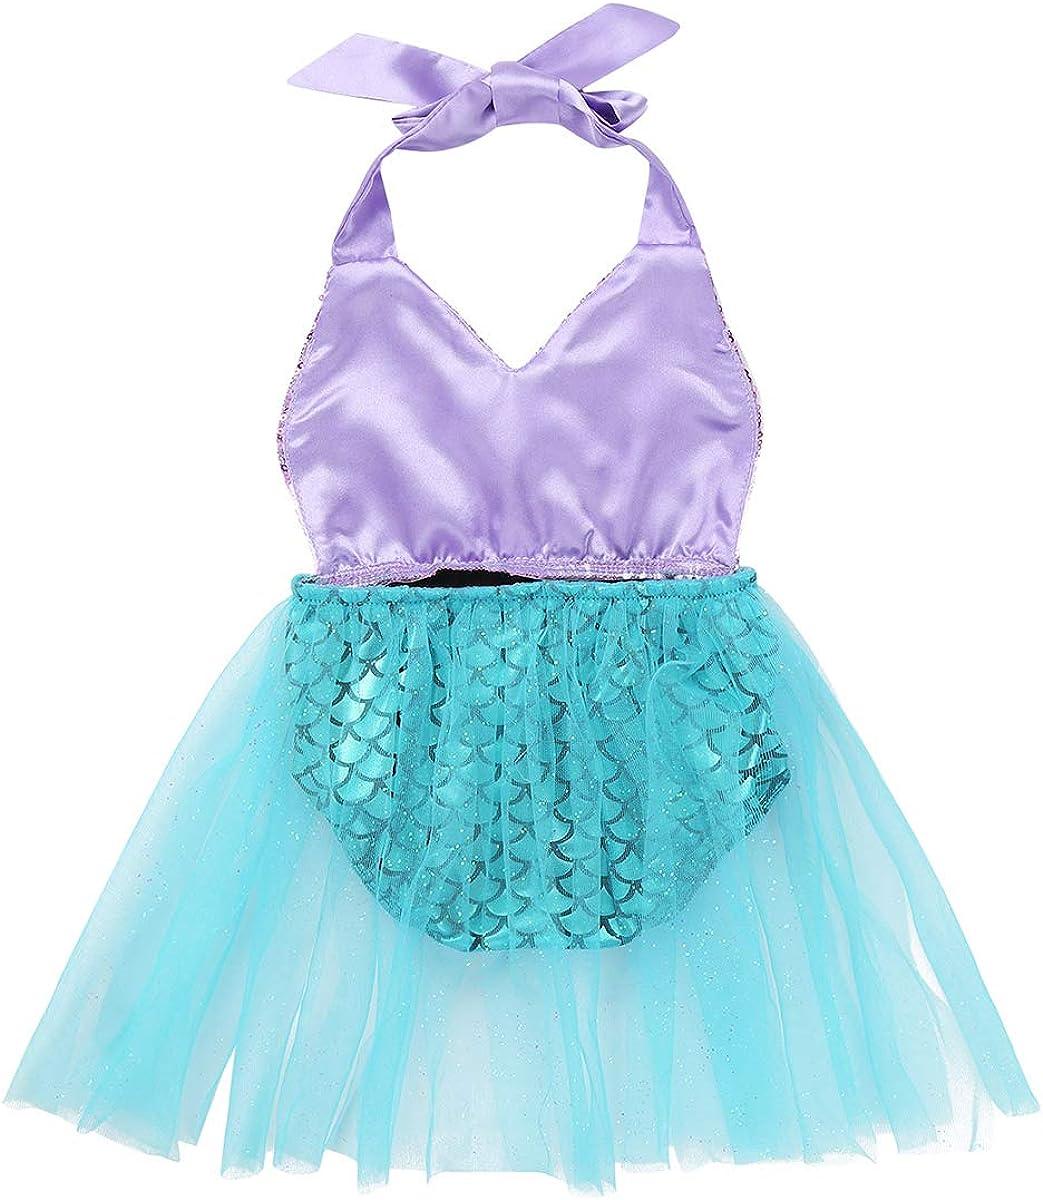 easyforever Infant Baby Girls Mermaid Swimsuit Sequined Halter Fish Scales Printed Cosplay Costume Beach Wear